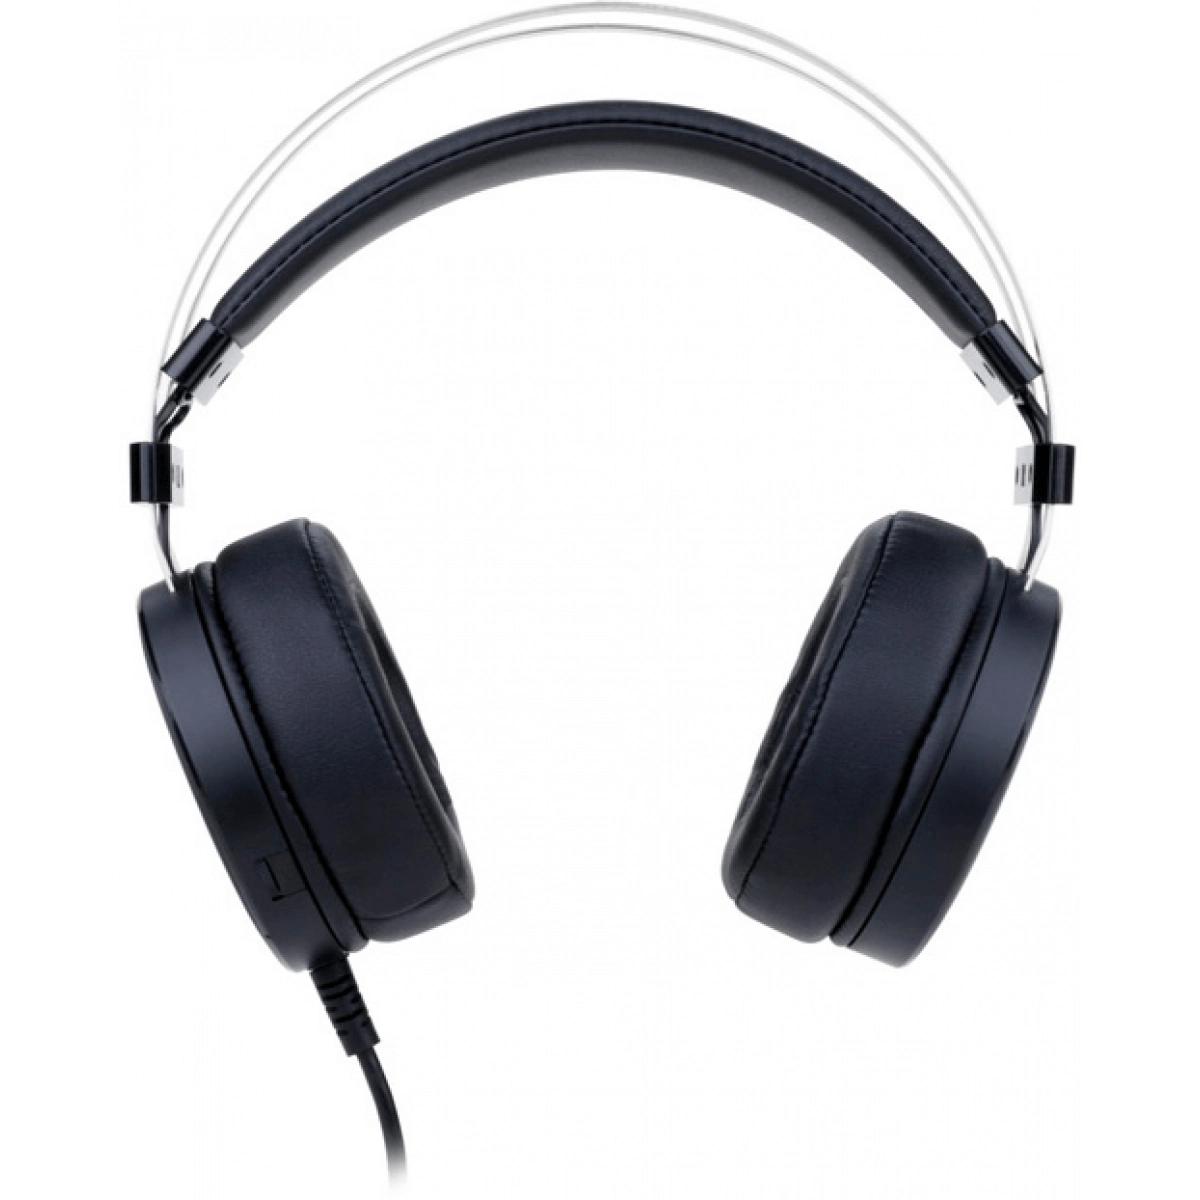 Headset Gamer Redragon Scylla H901 P2 PC PS4 Xbox One, VR e Mobile